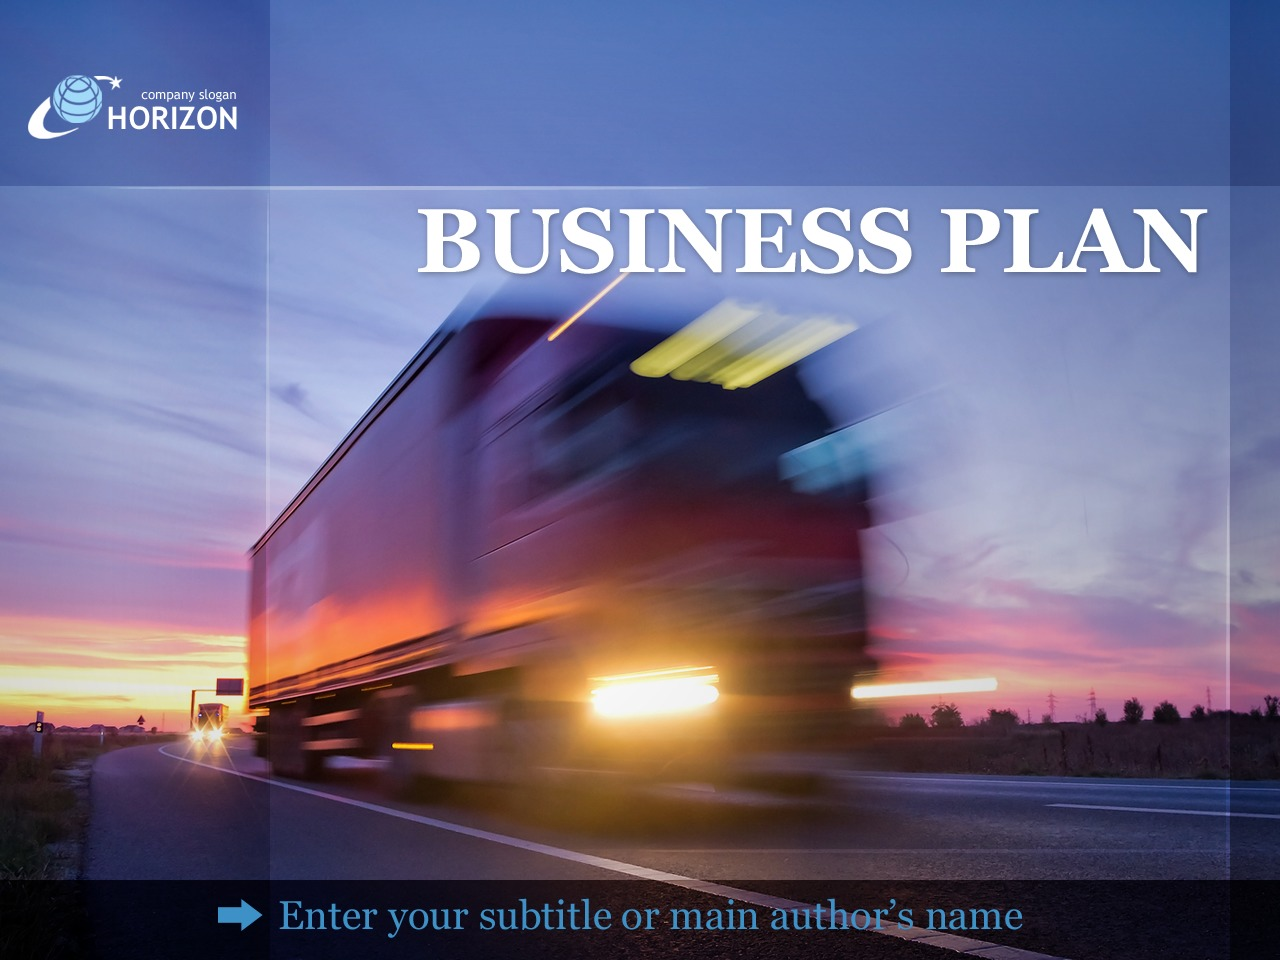 Szablon PowerPoint #36536 na temat: transport